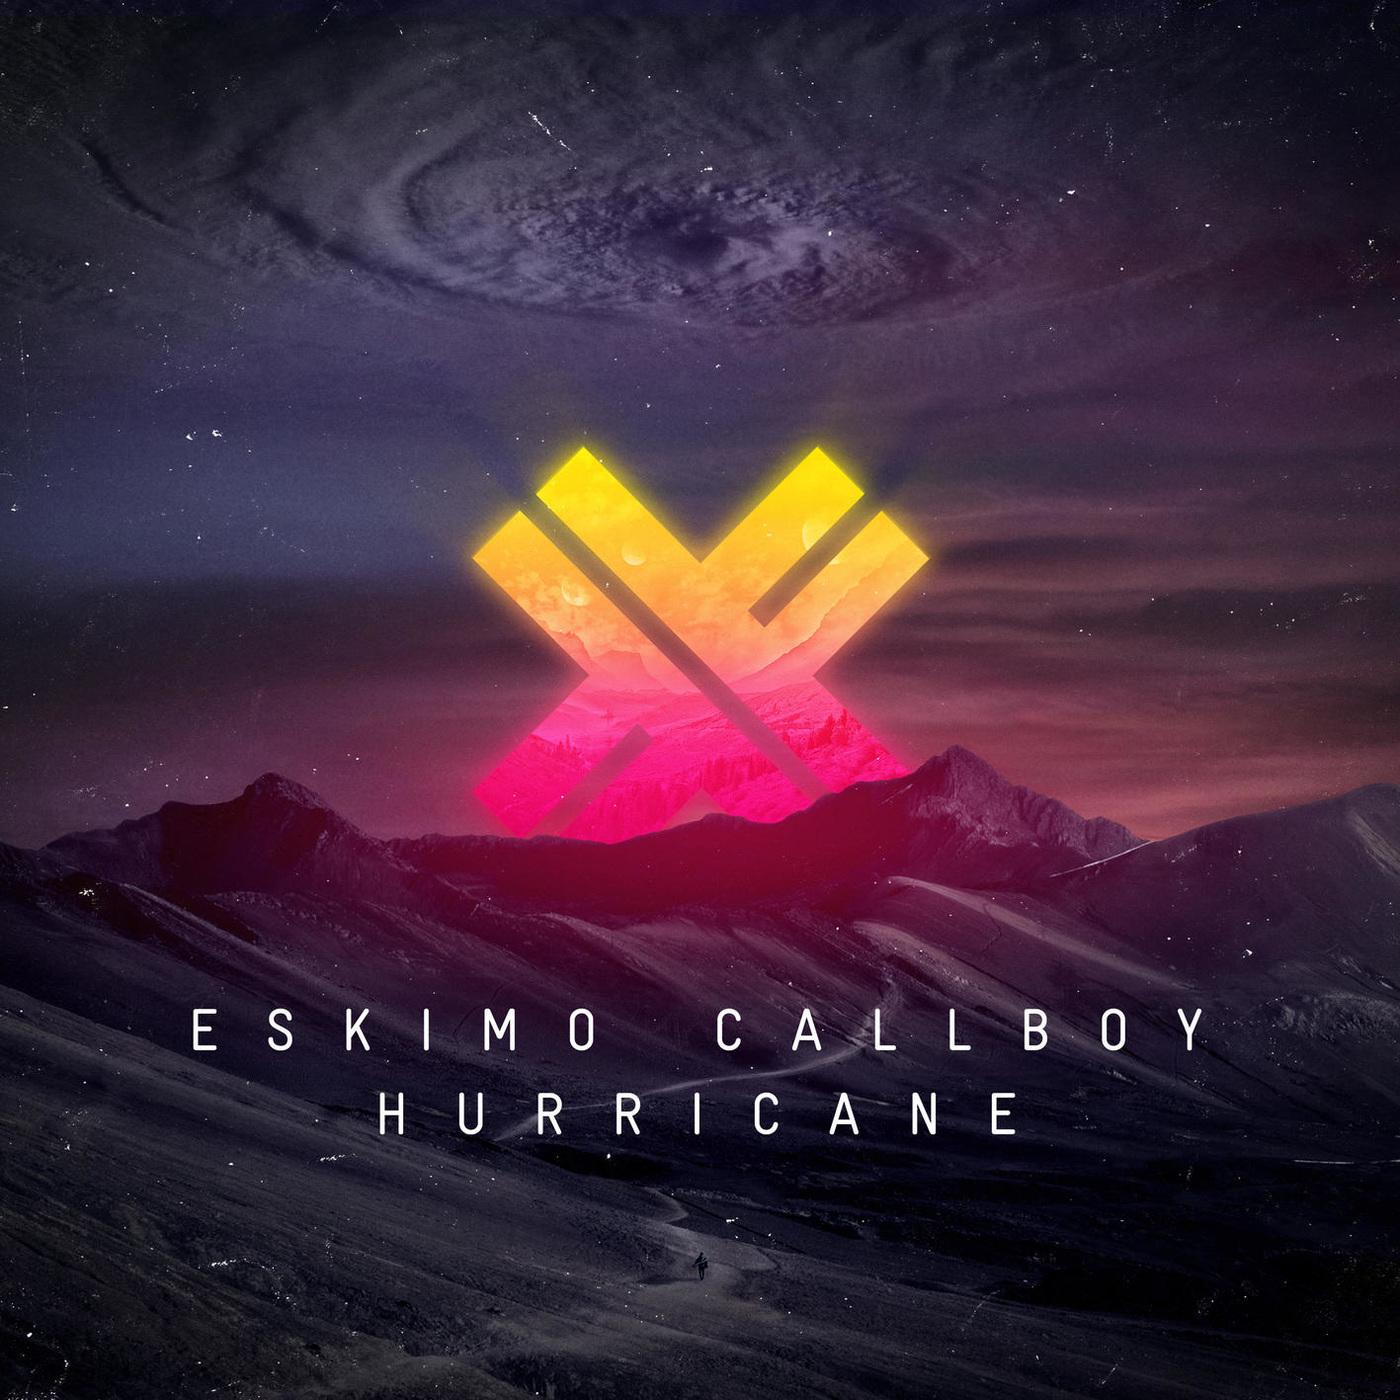 Eskimo Callboy - Hurricane [single] (2019)